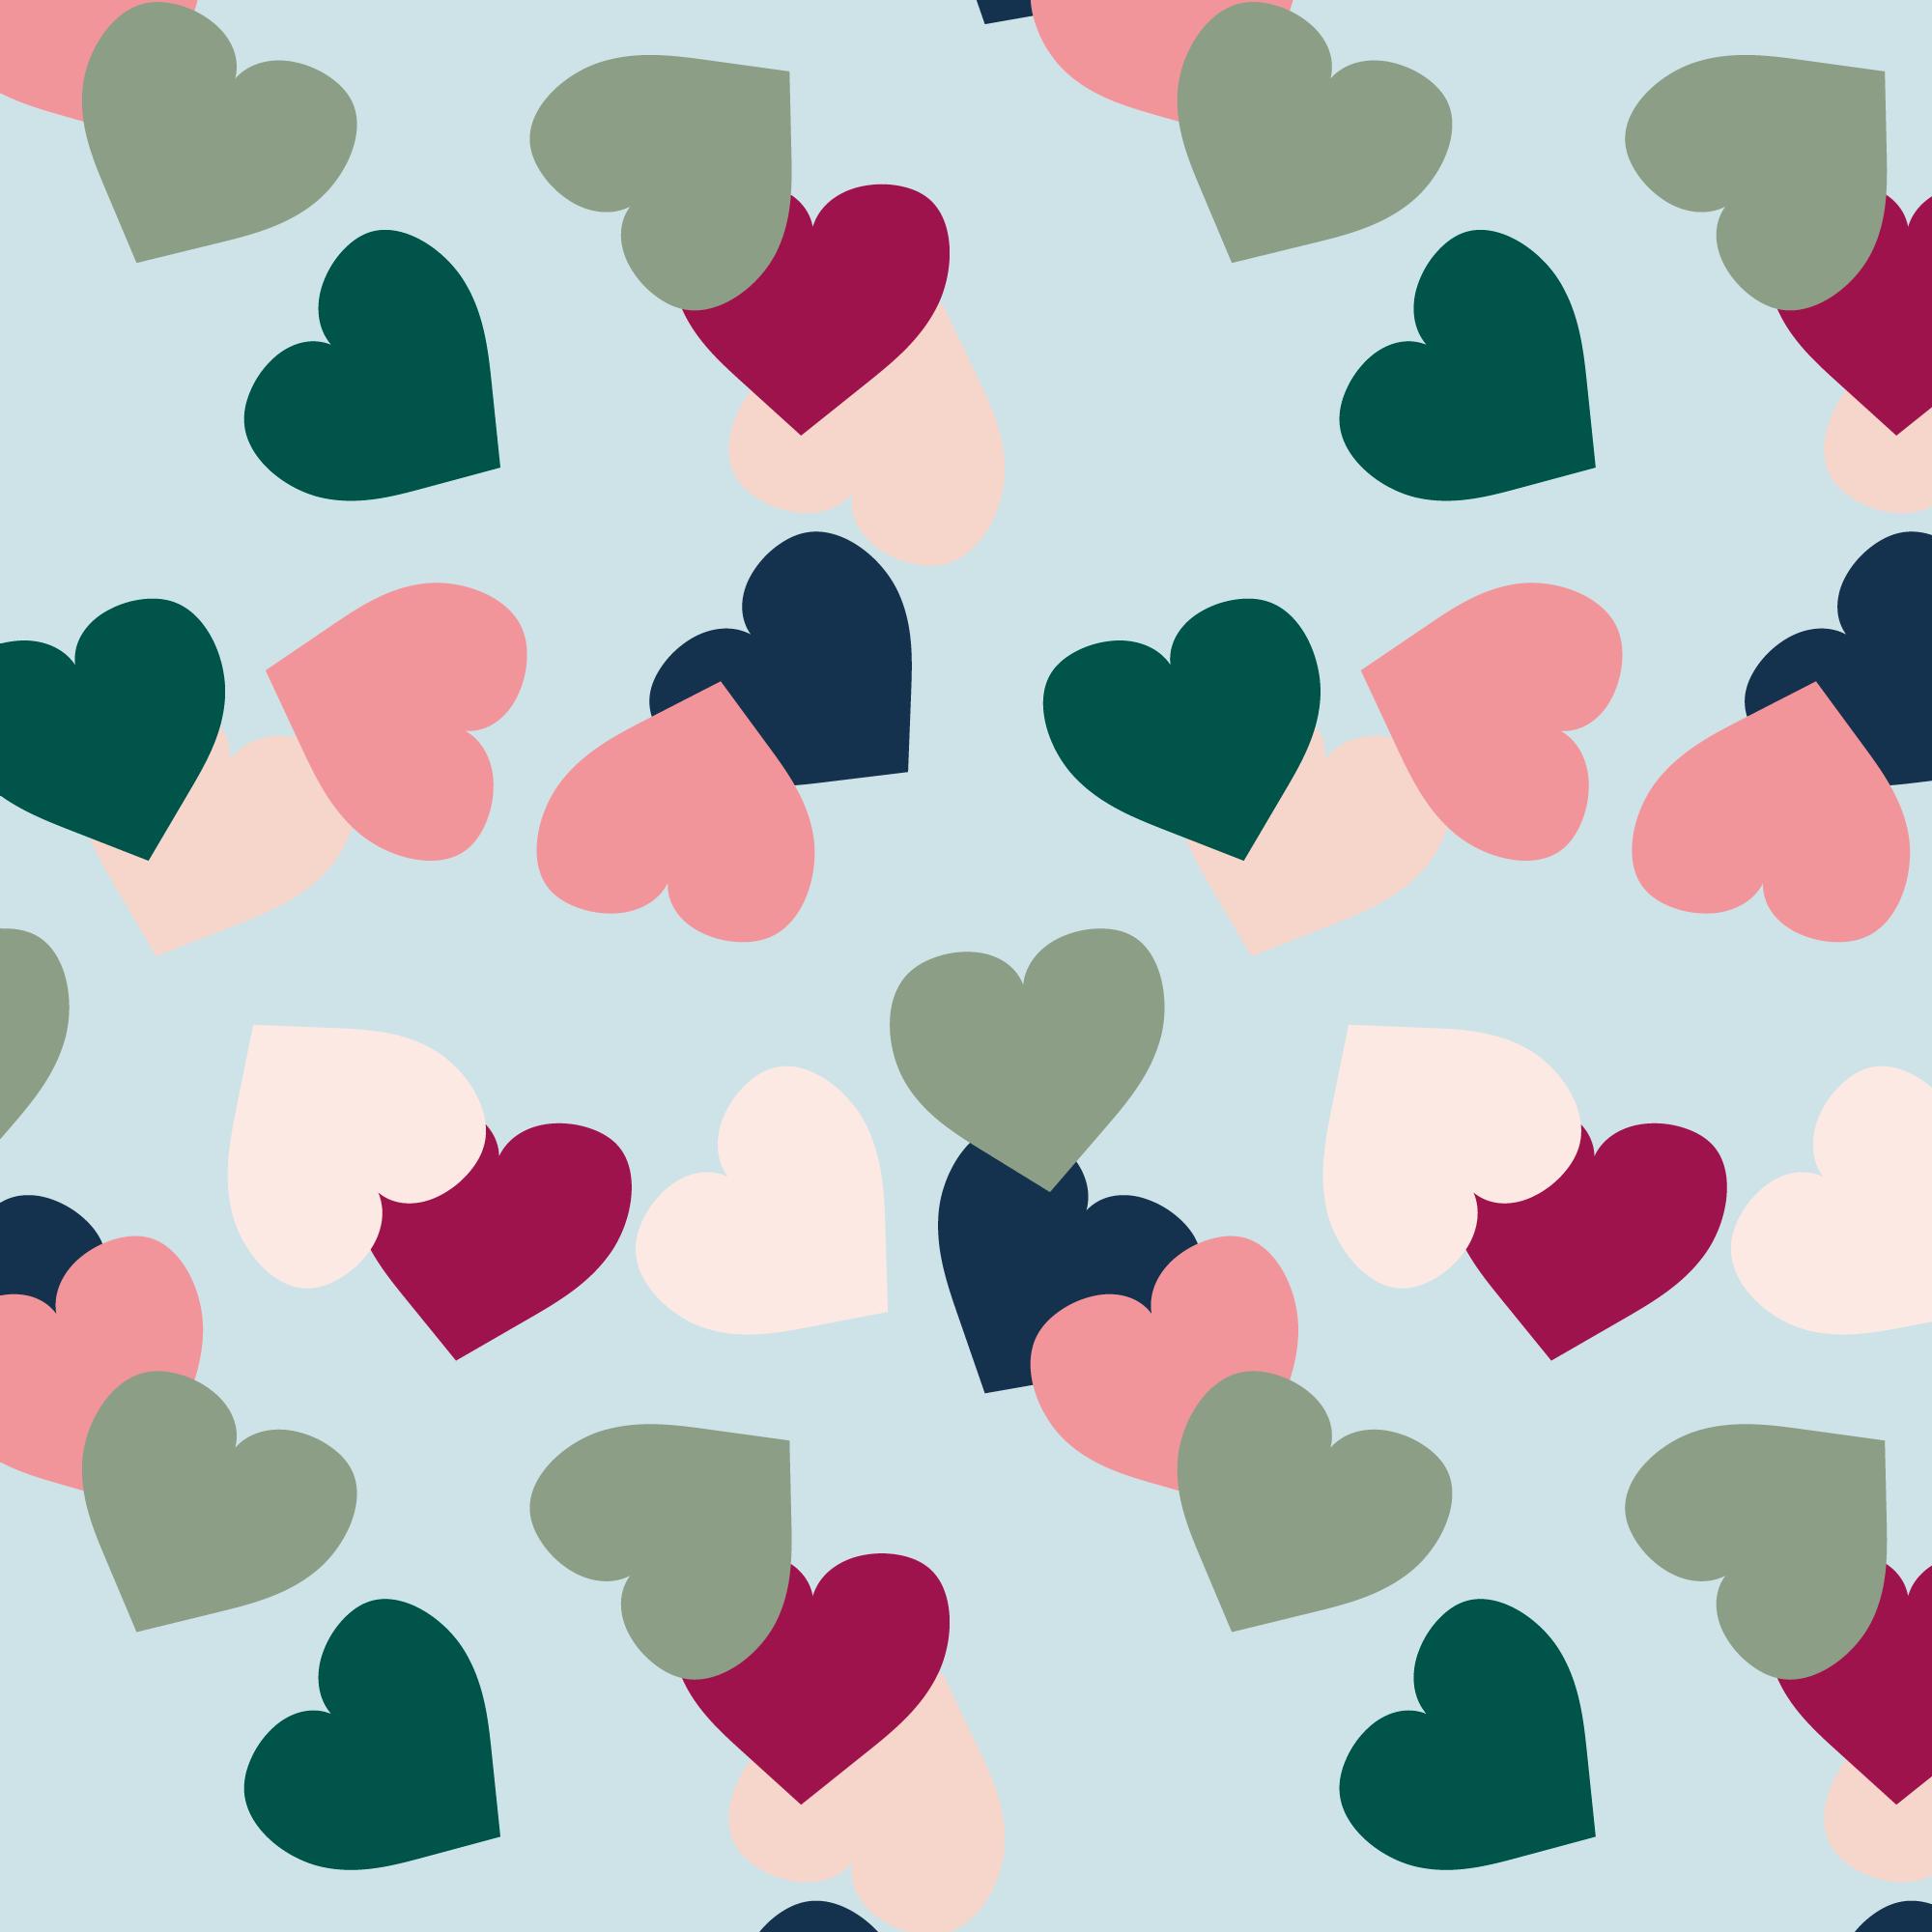 Colored hearts III